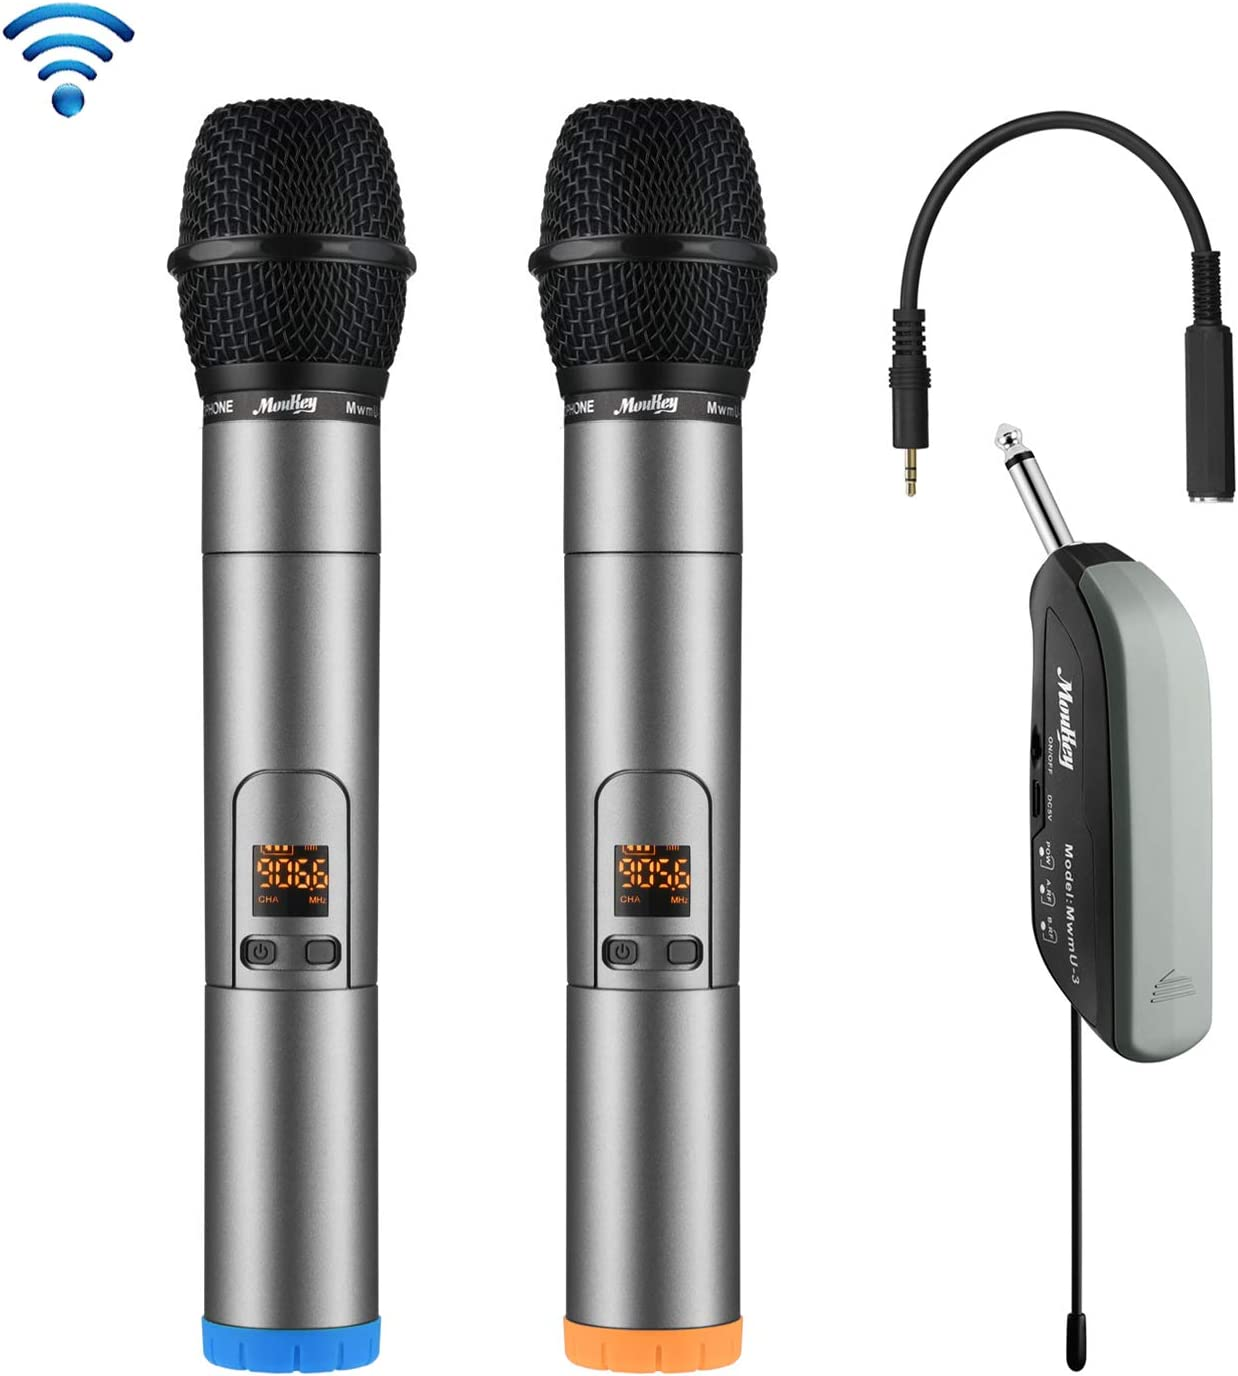 260 Channels Professional Dual Handheld Dynamic Mics Cordless Anti-Interference Moukey MwmU-1 UHF Wireless Microphone System Rechargeable 262ft Range for Karaoke Maichine DJ Church